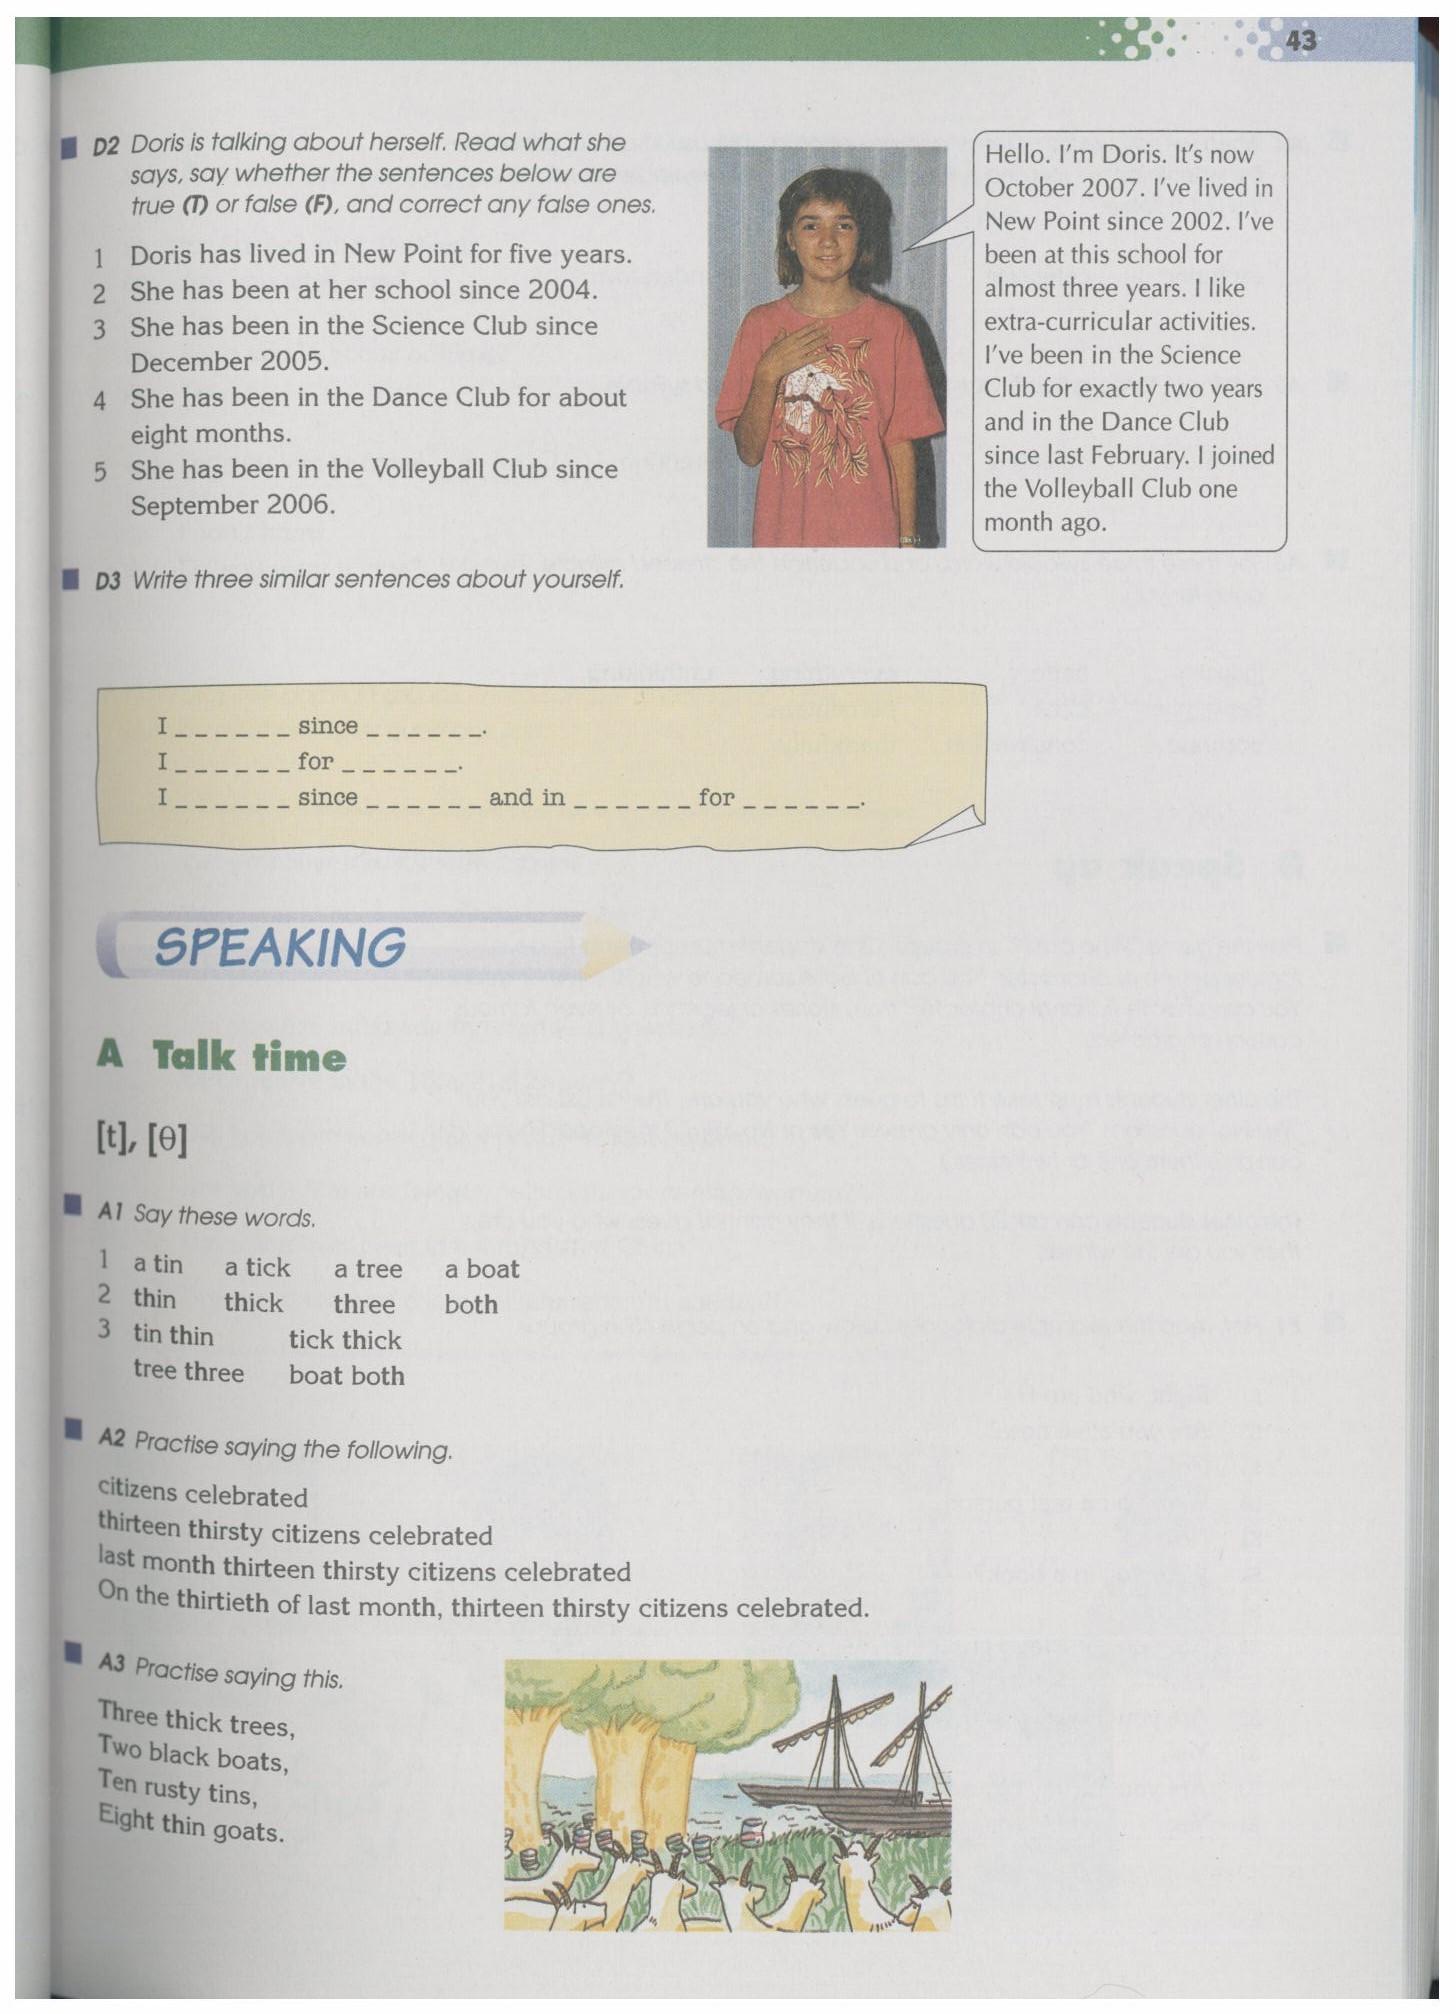 沈阳版牛津英语9A教材Chapter3-Speaking